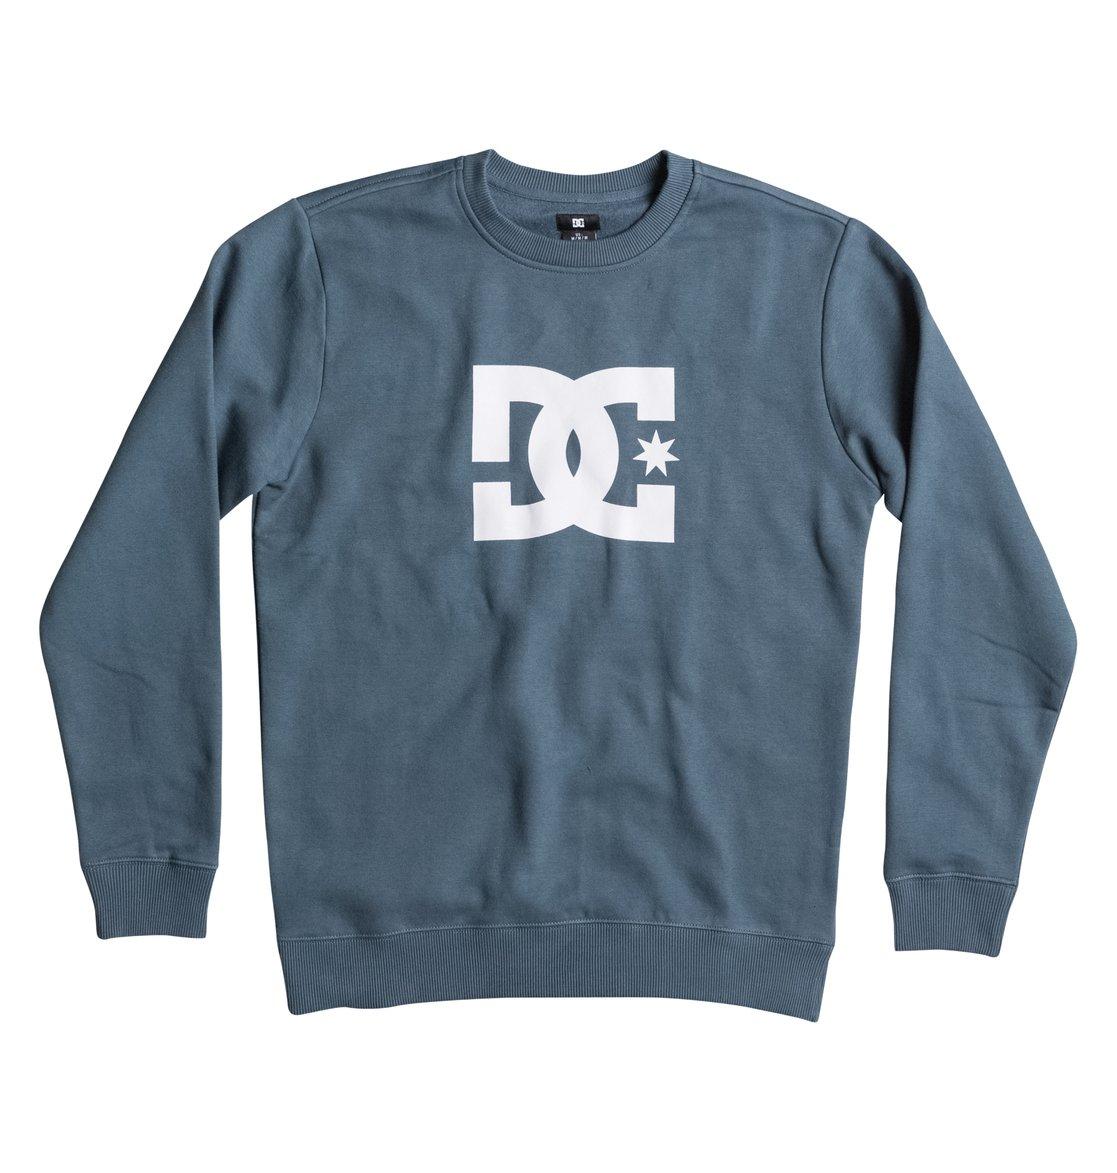 de84ec6c238a 0 Star Crew Sweatshirt ADYFT03007 DC Shoes